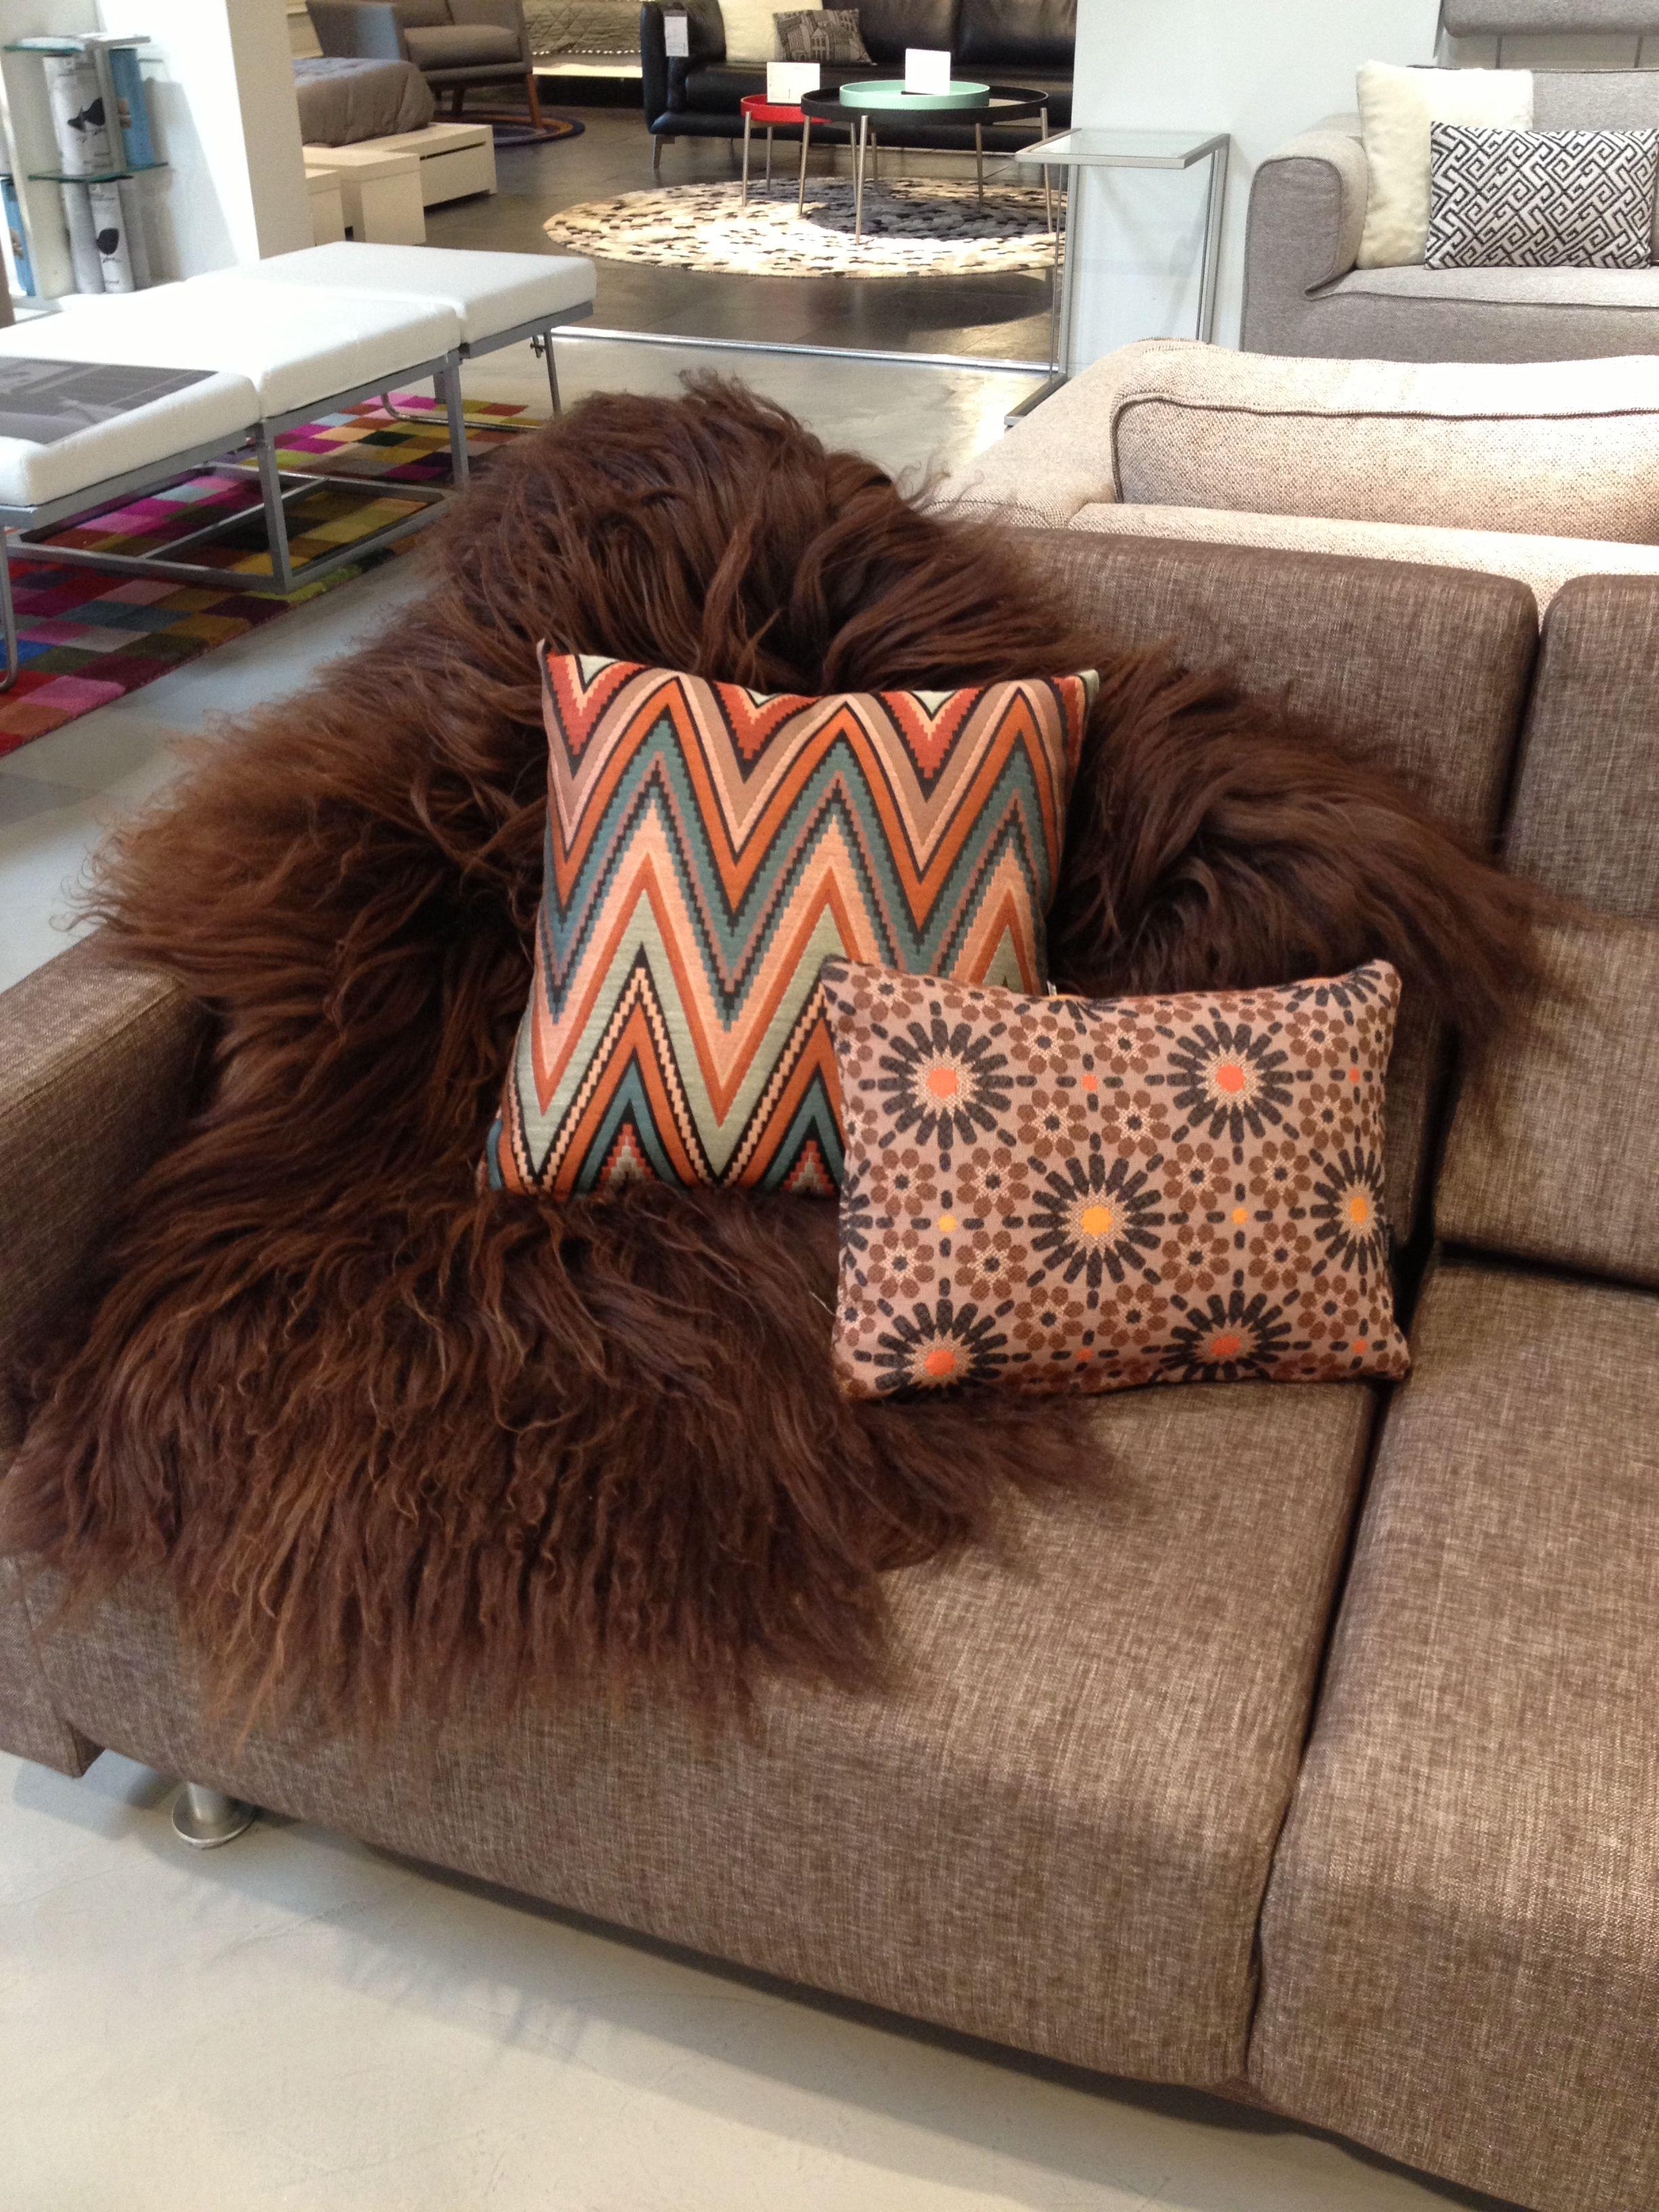 Cushion love!